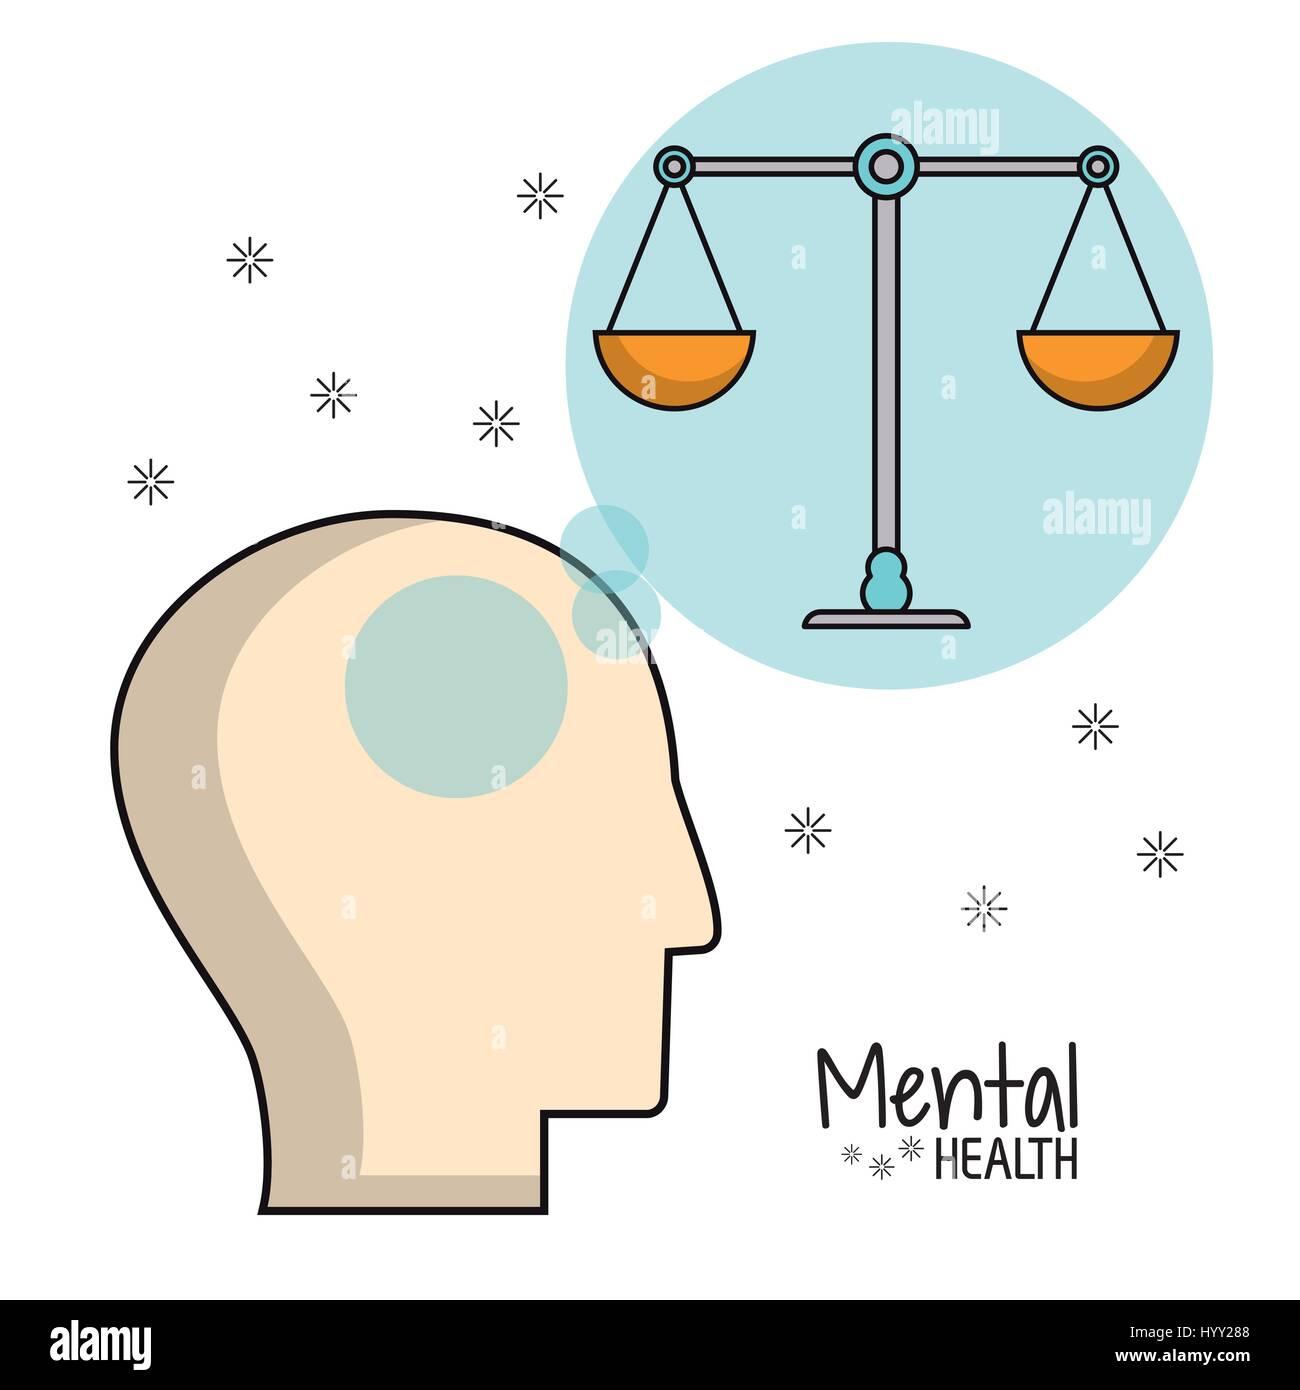 mental health head balance image - Stock Image